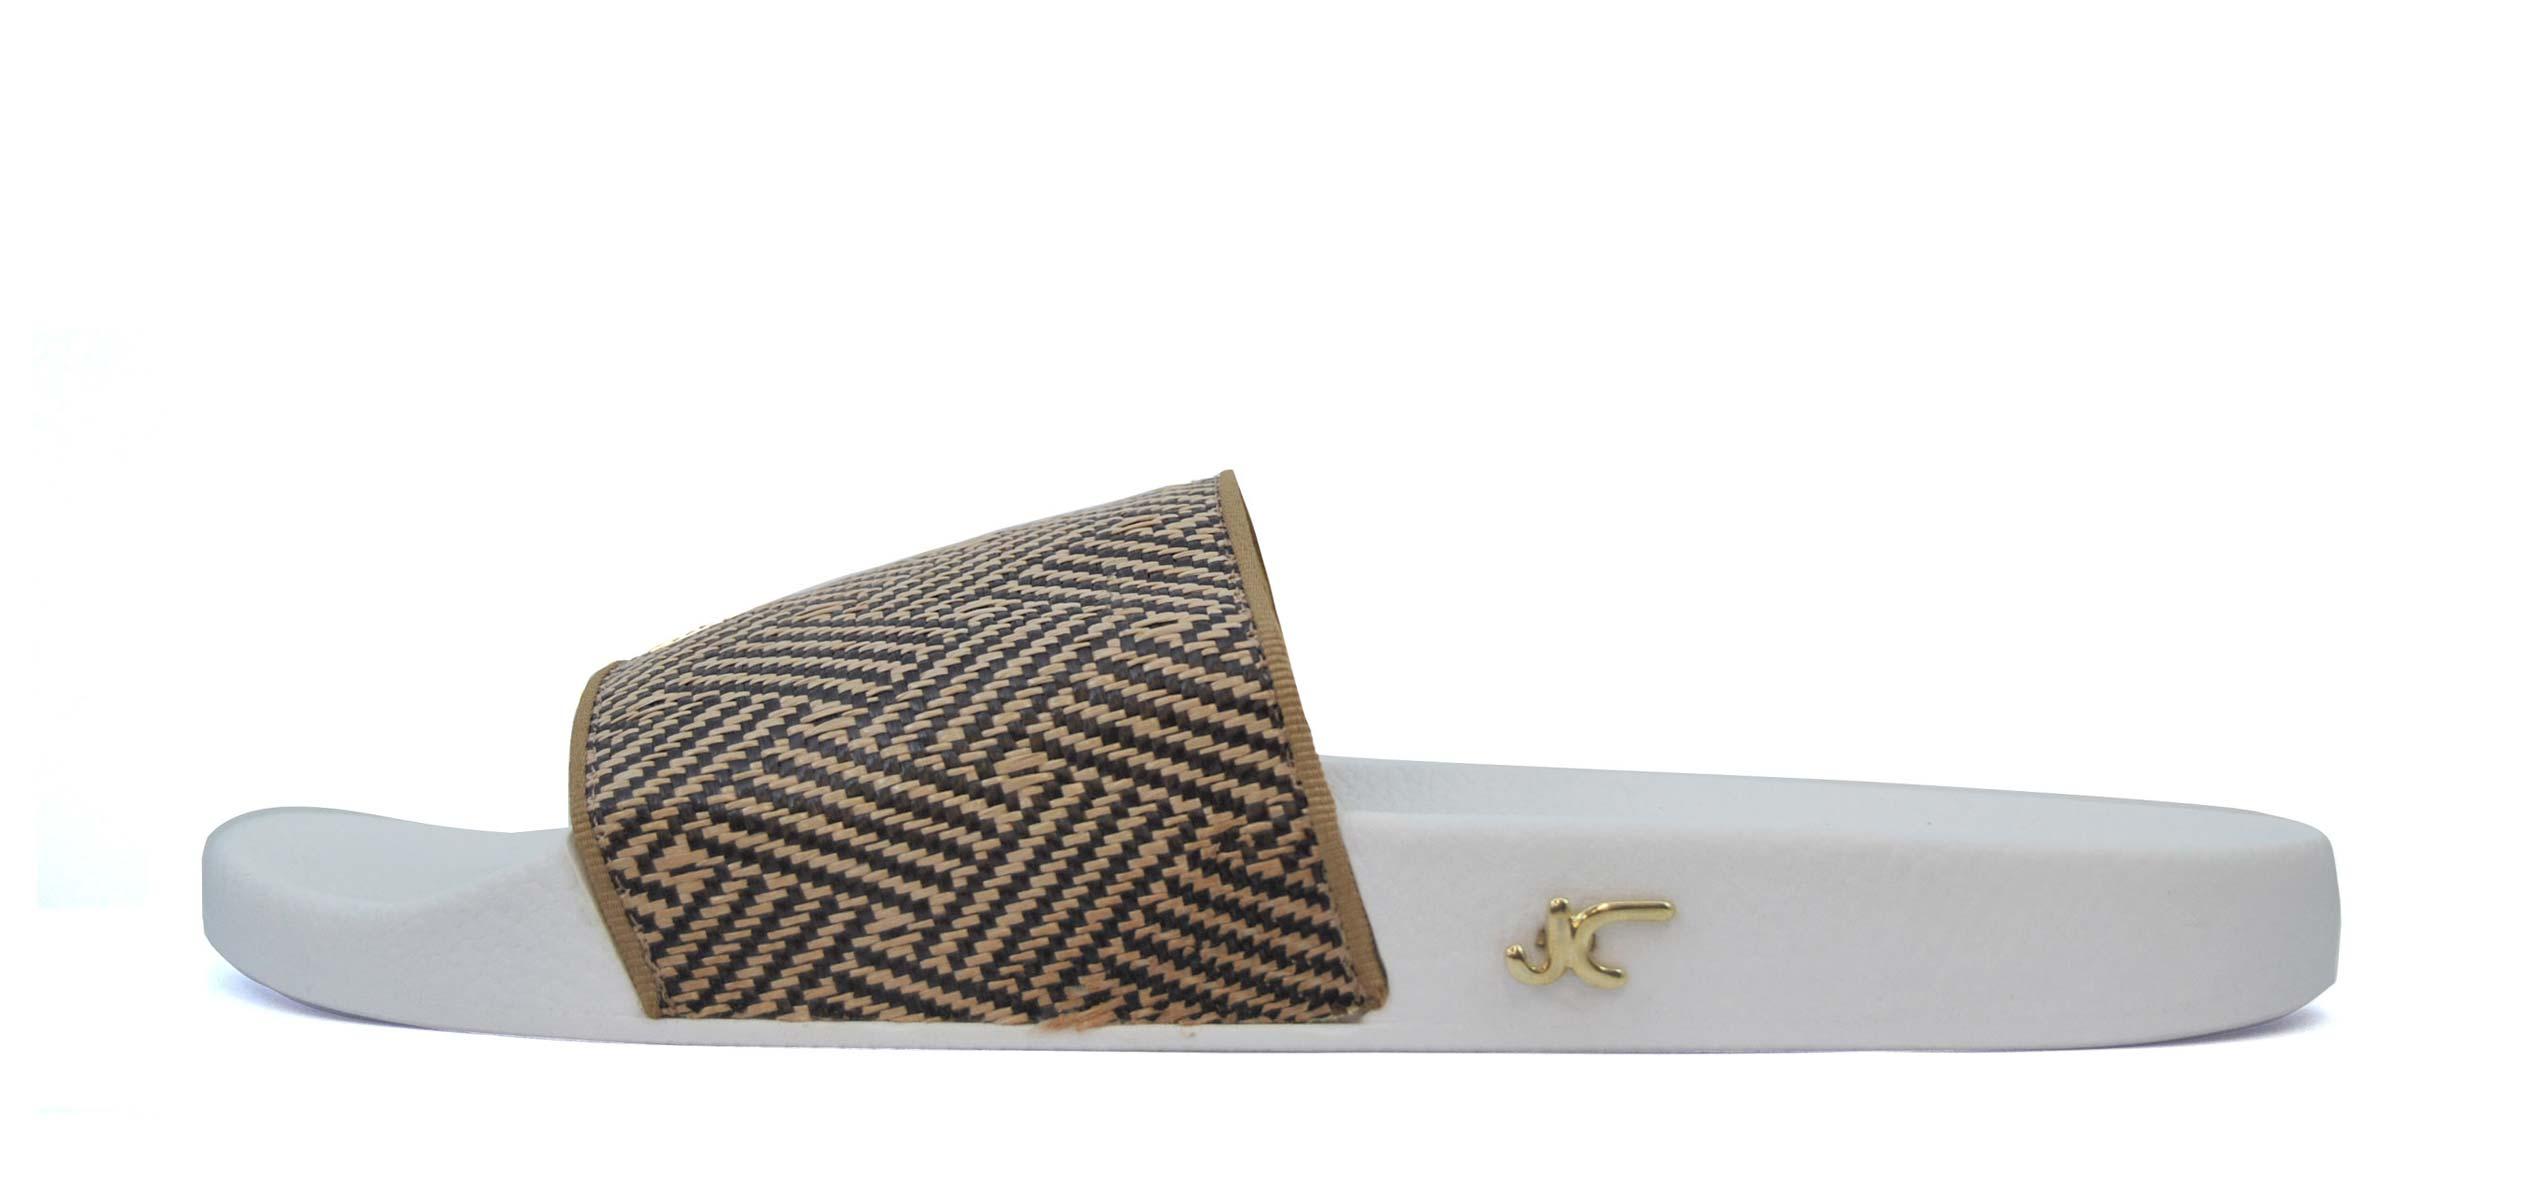 Foto 1 de Chancla blanca con pala espiga cruzada marron